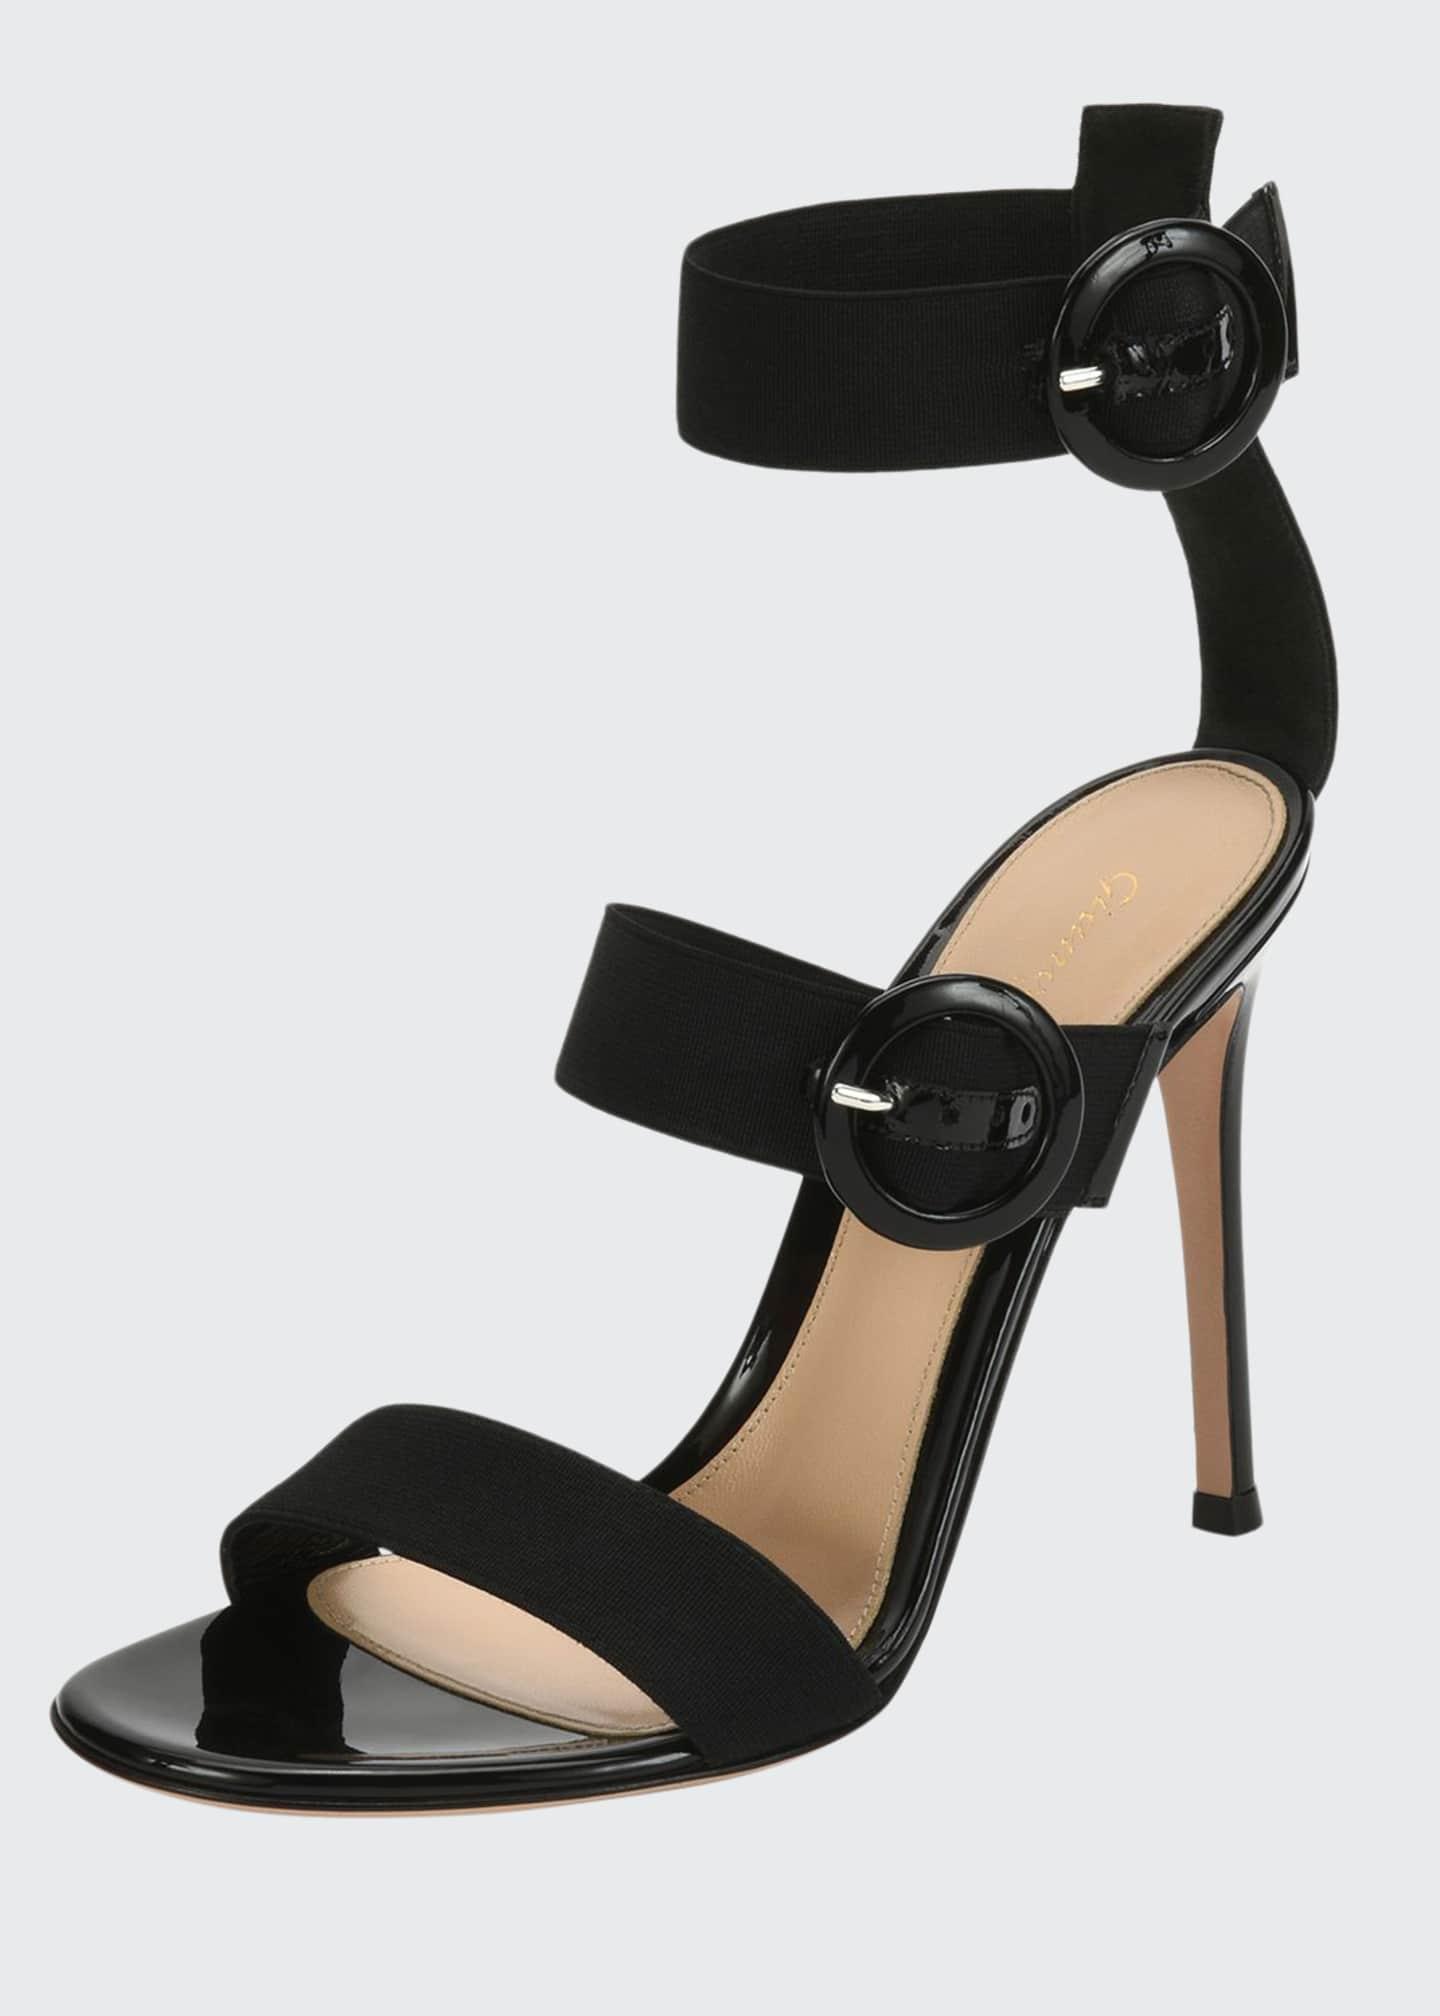 Gianvito Rossi Velvet Three-Strap Sandals